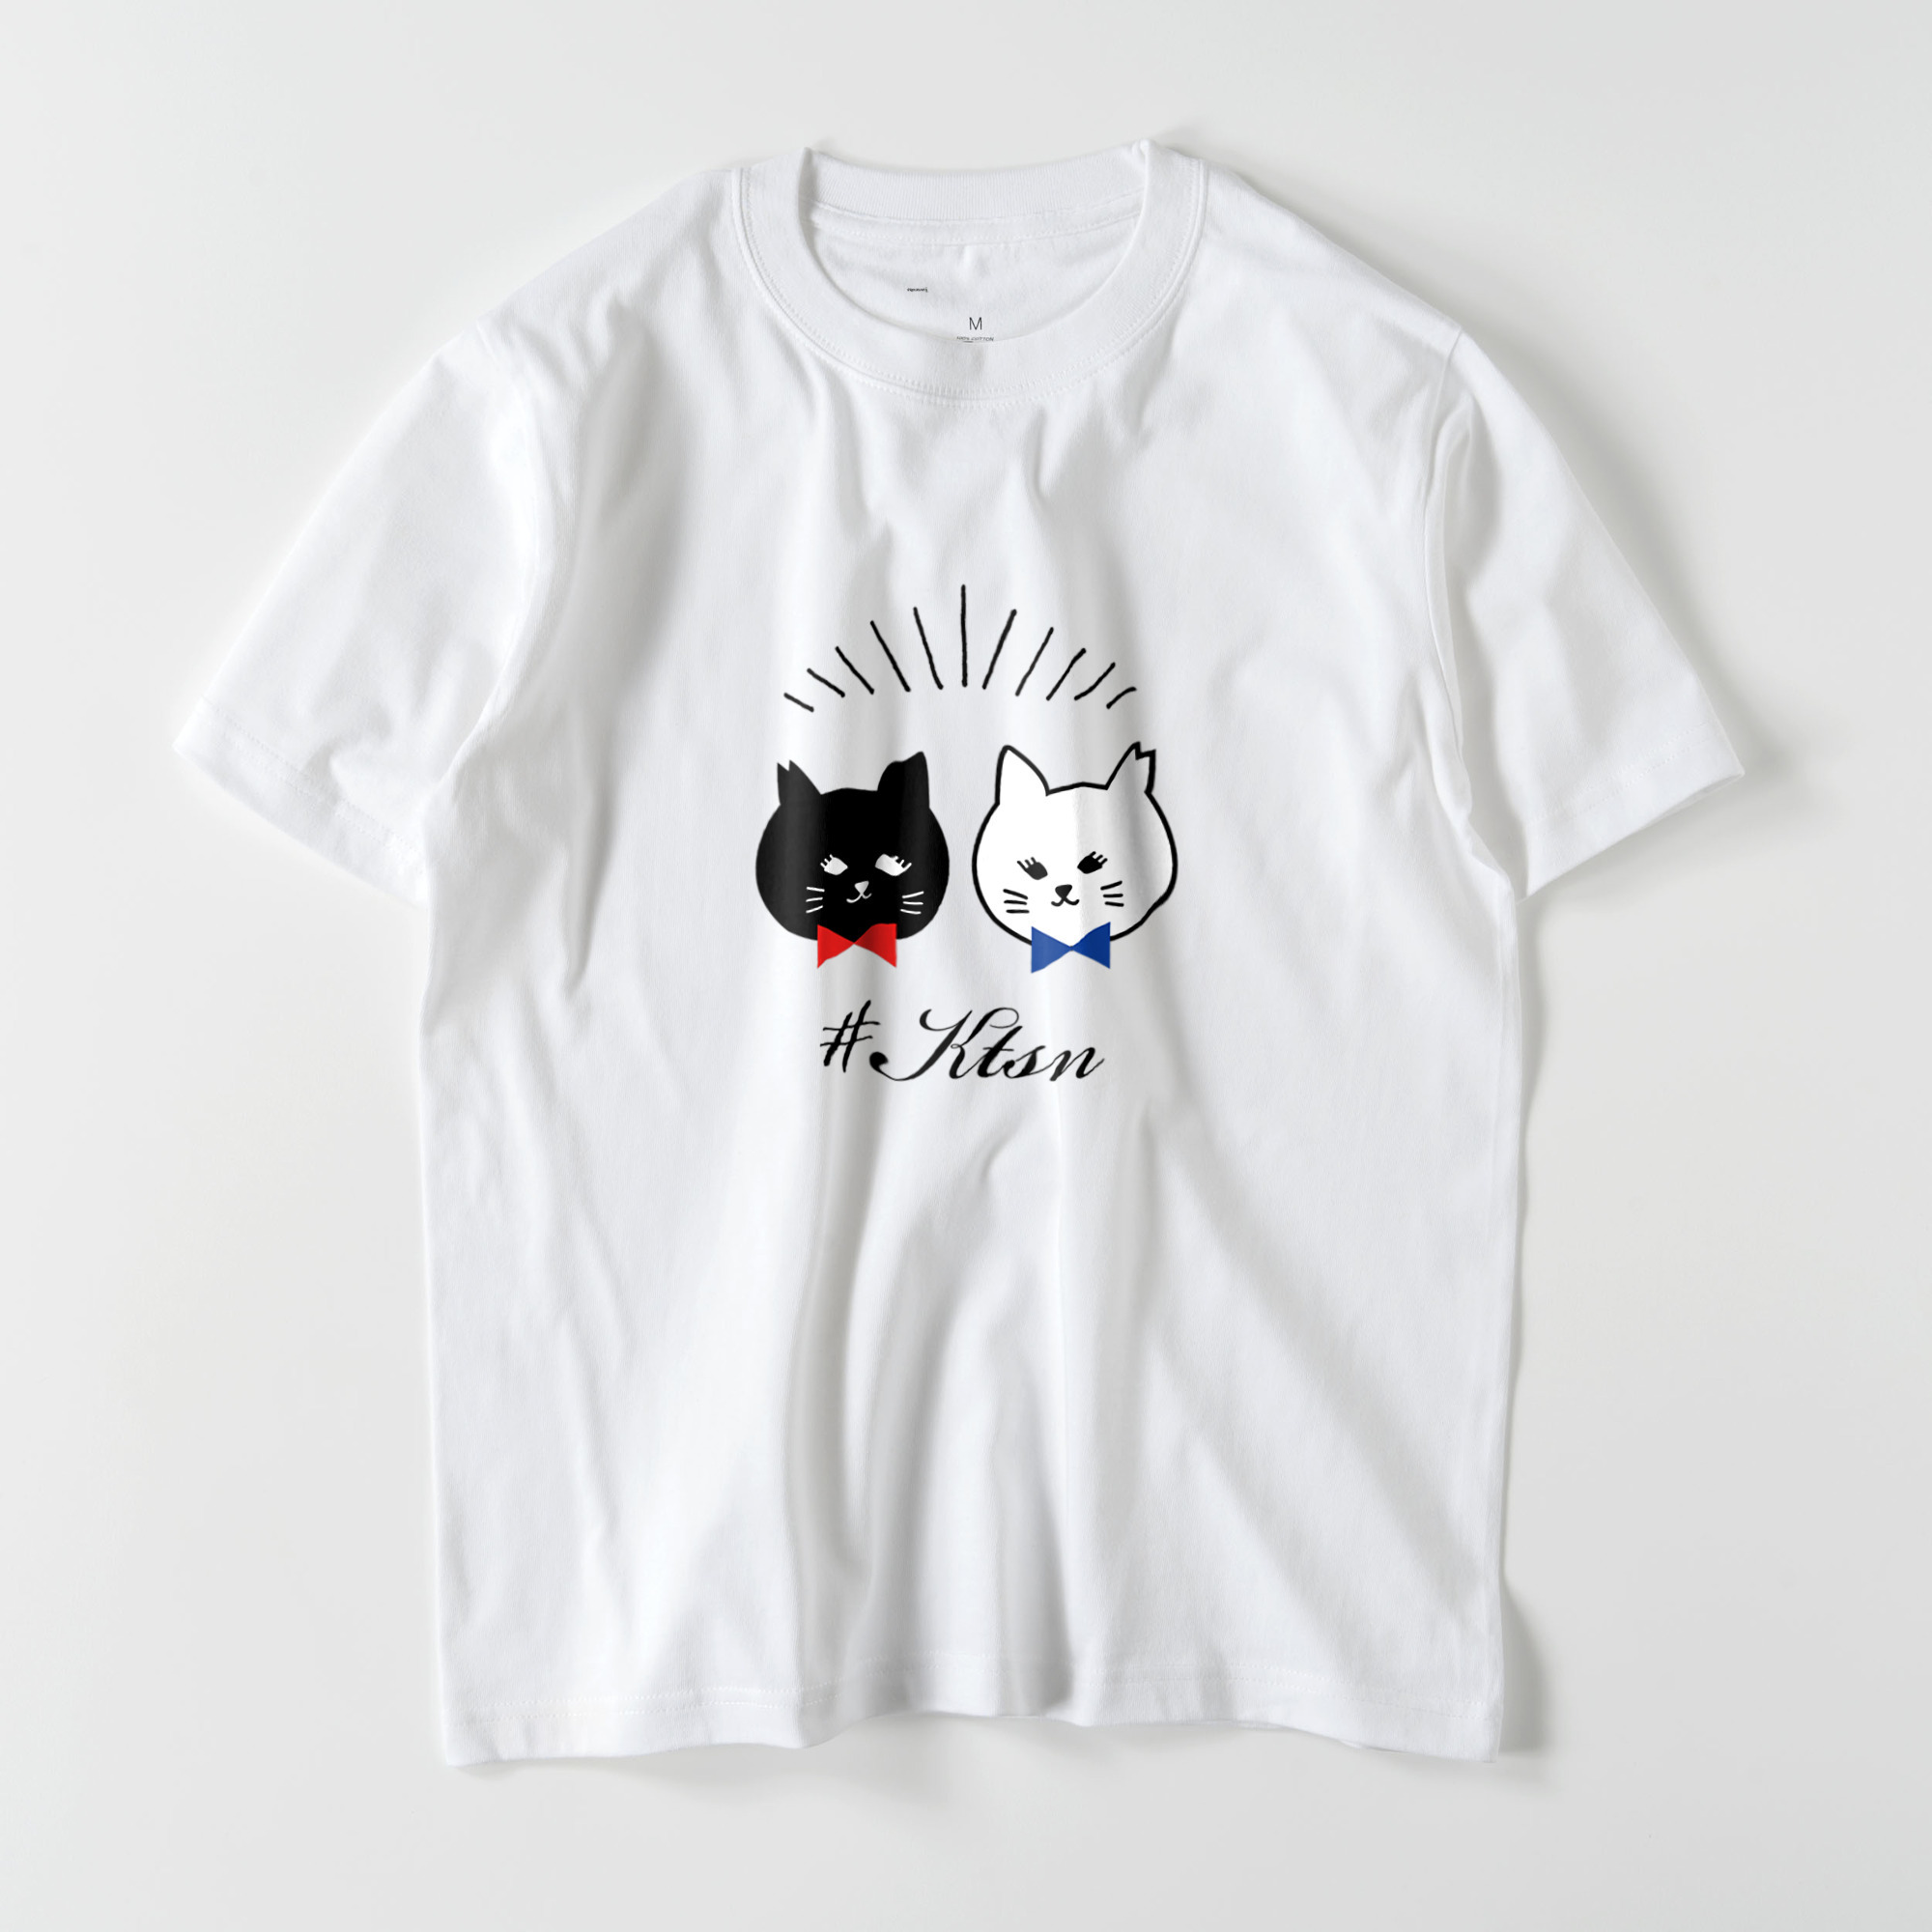 #KTSN×kaco Tシャツ